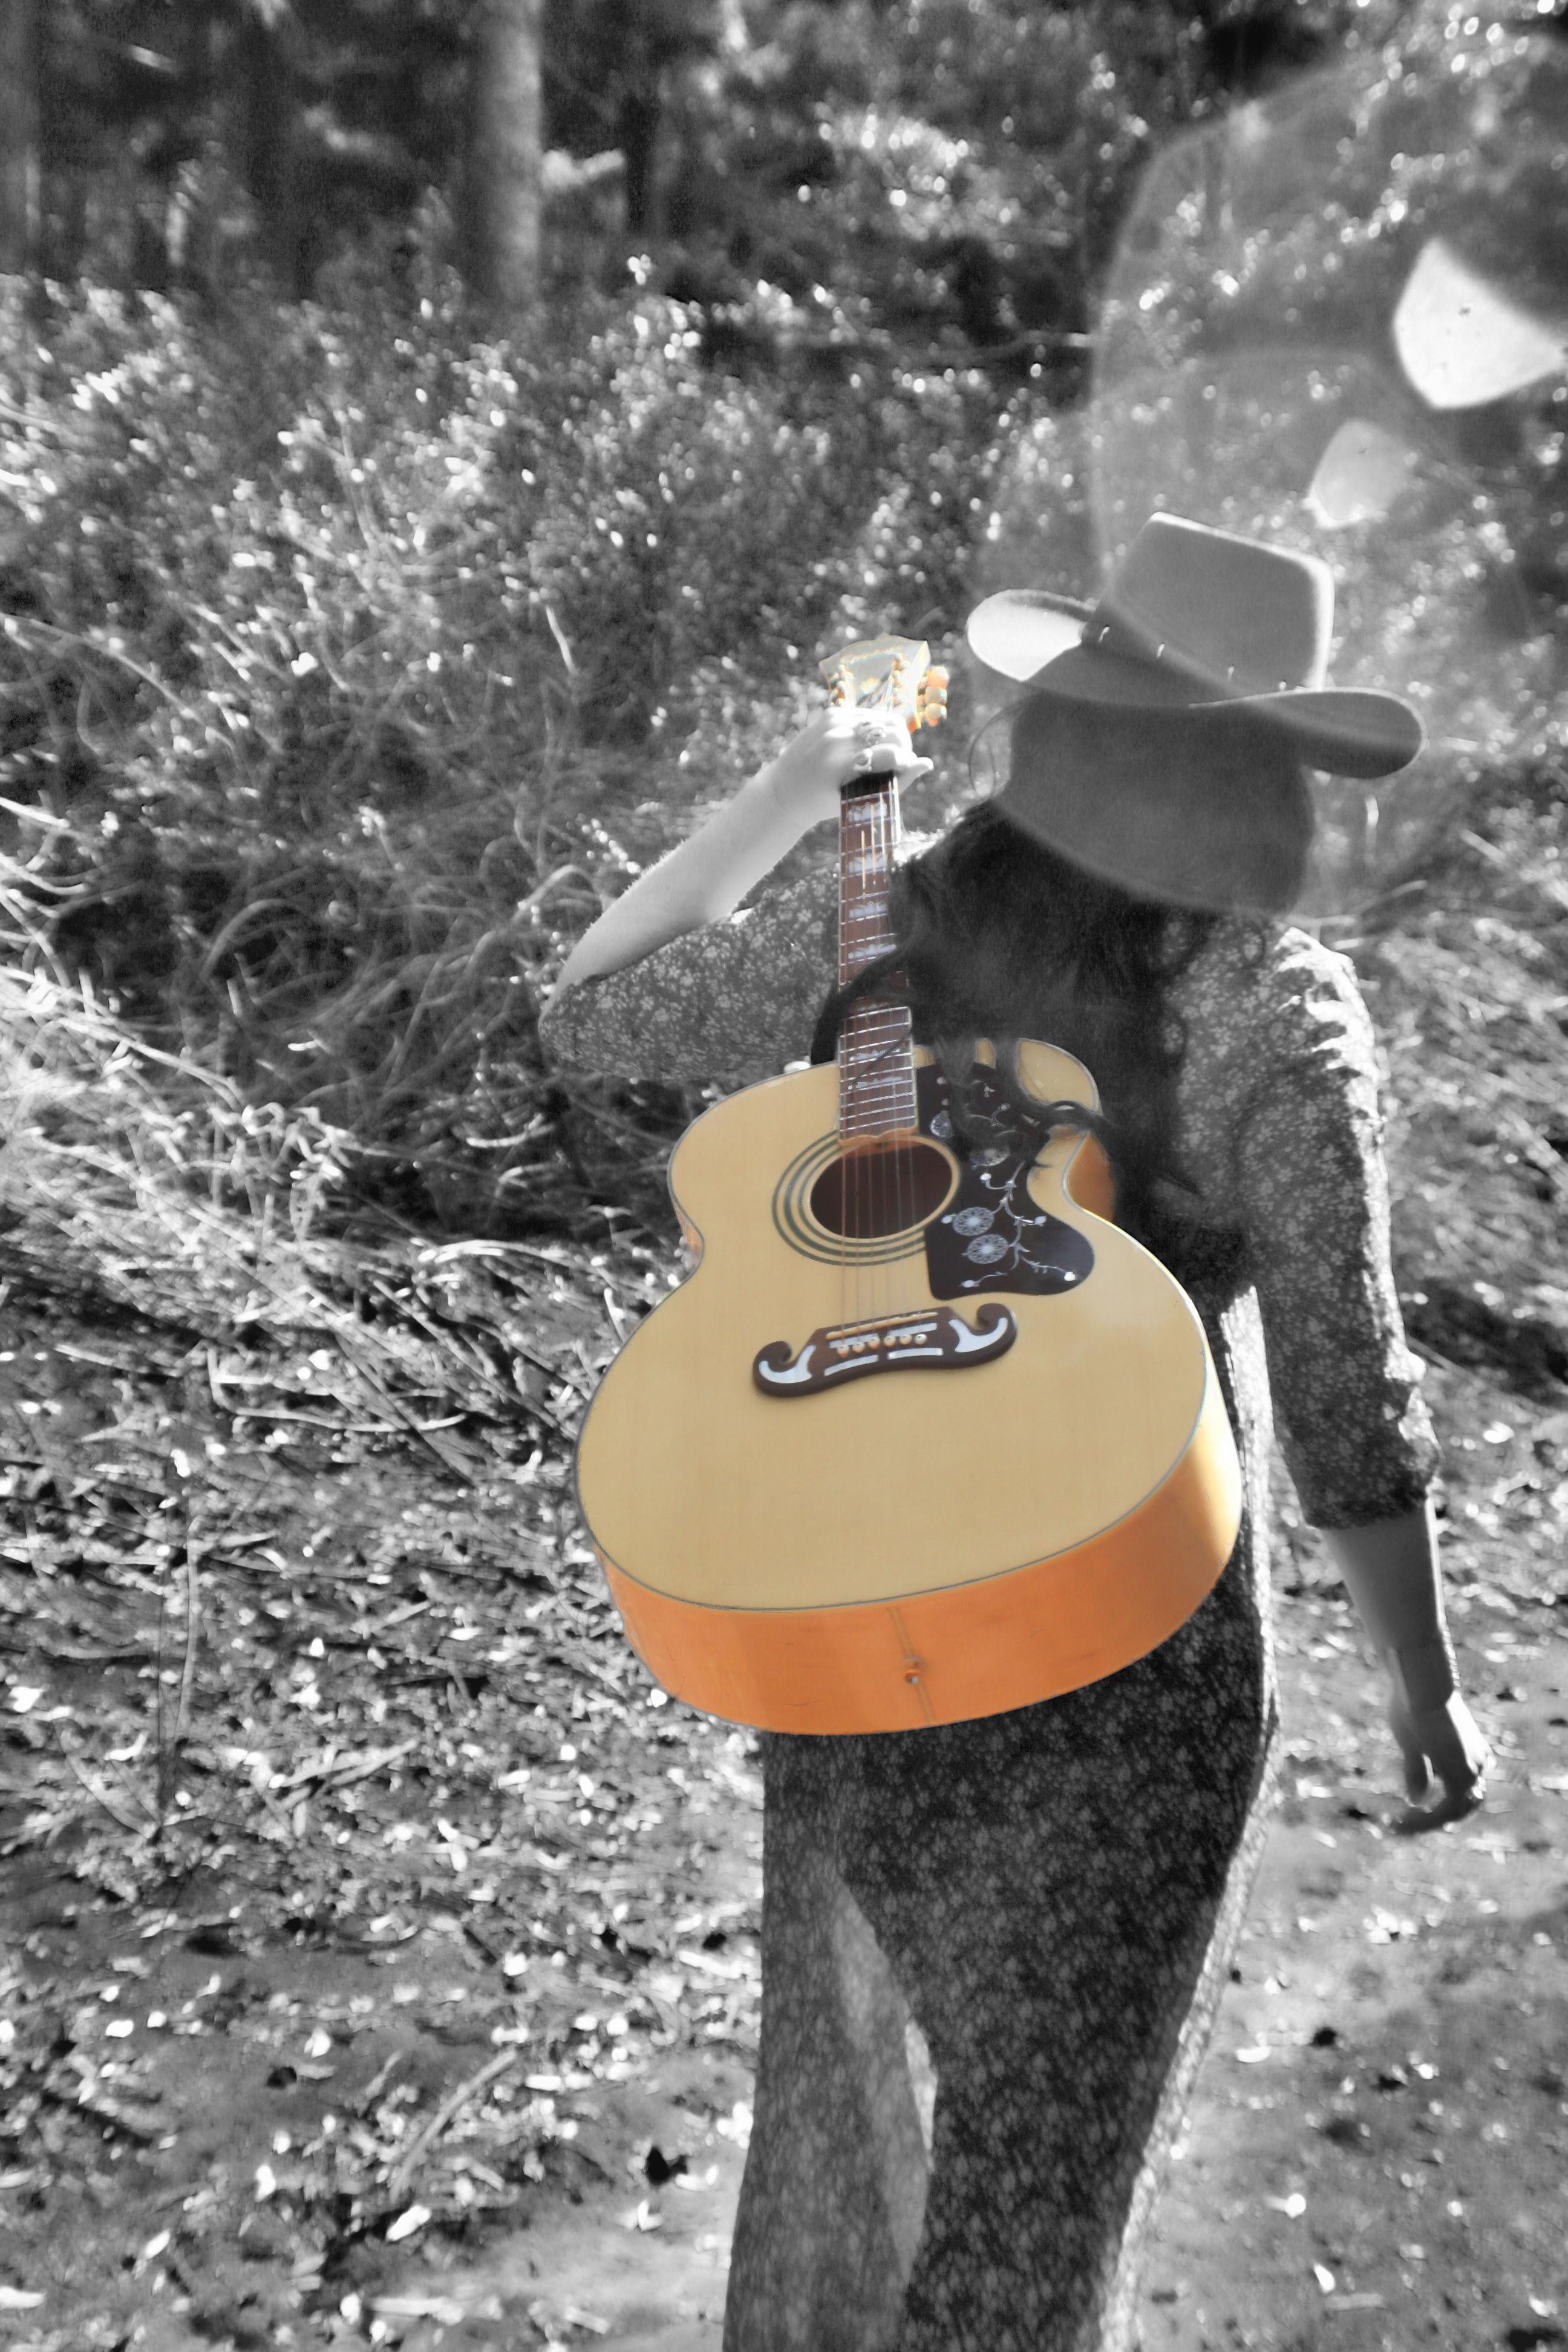 walking_away_with_Guitar_BnW